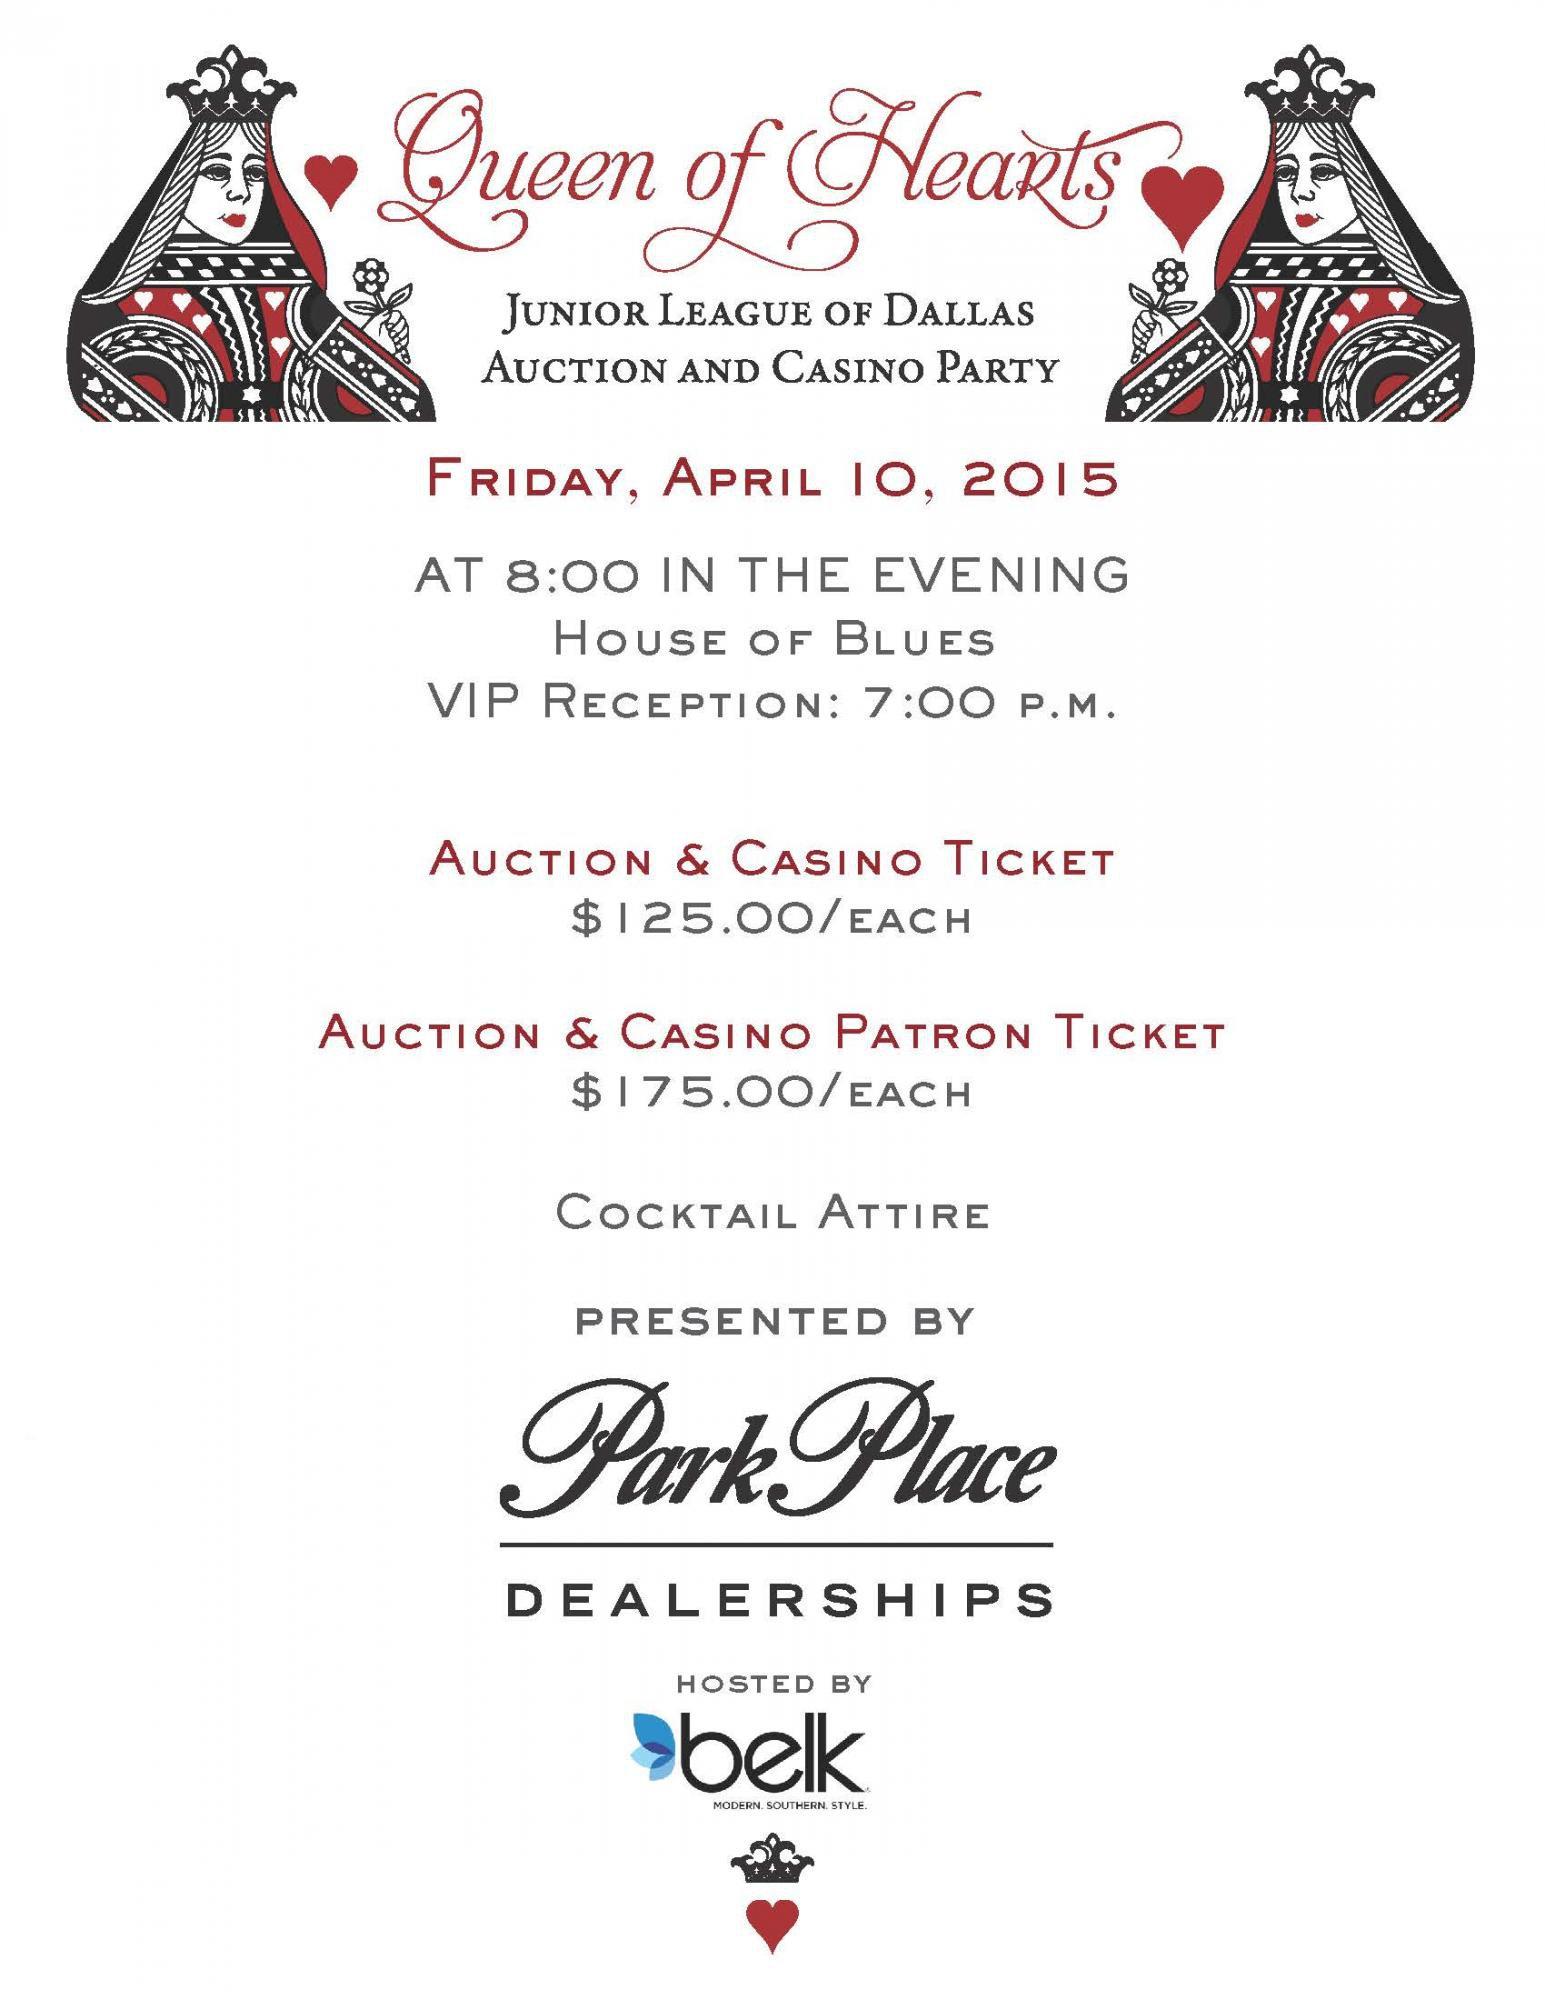 Jld auction x26 casino party casino carte maestro